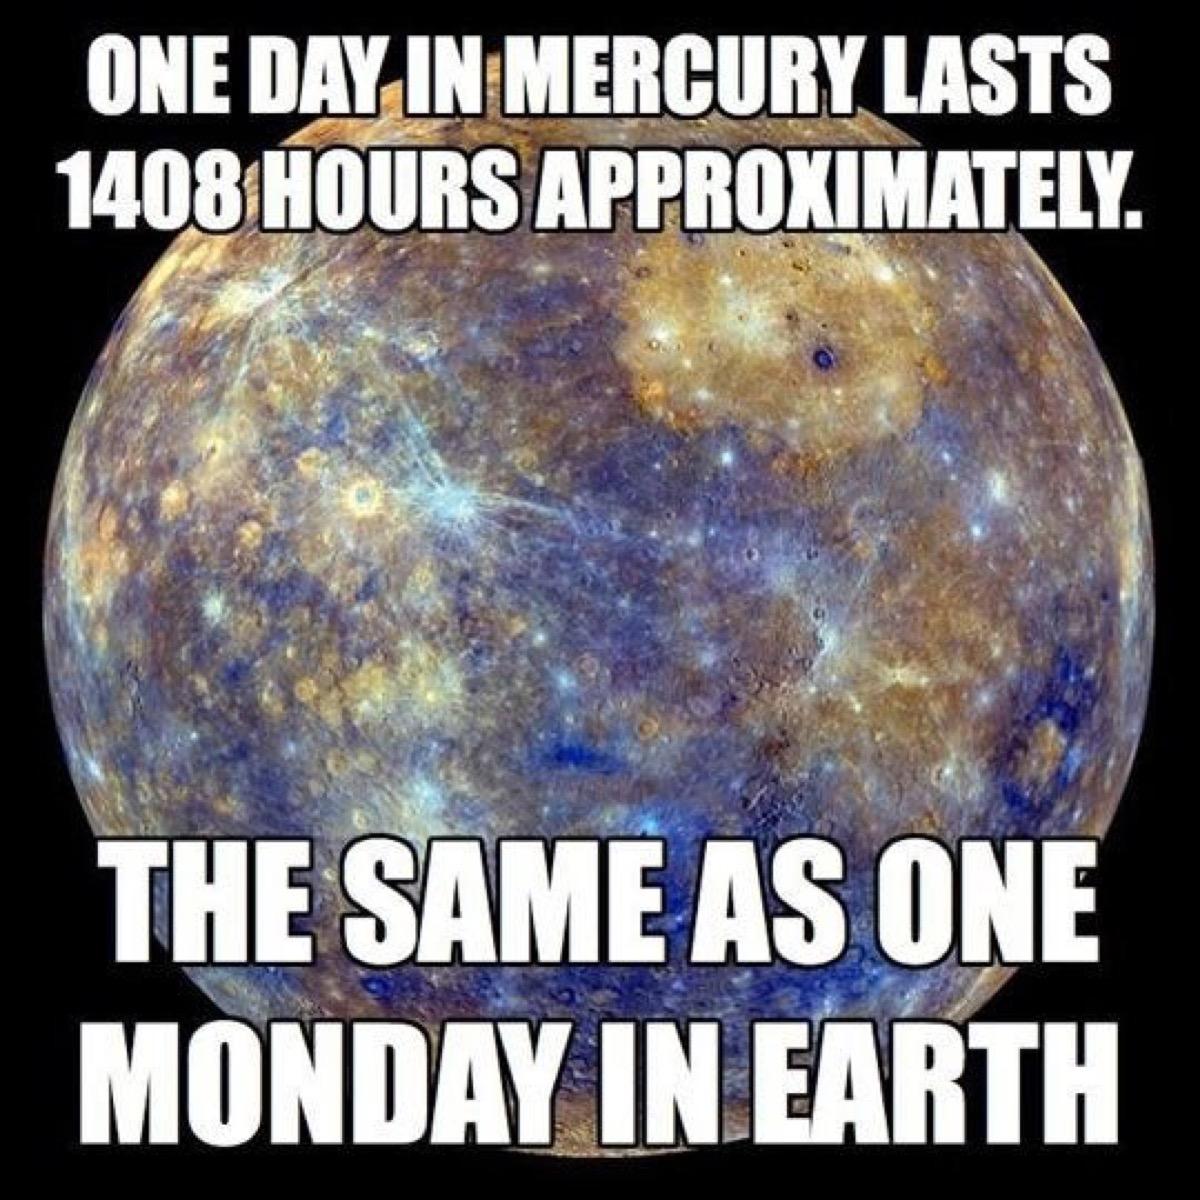 mercury, monday memes